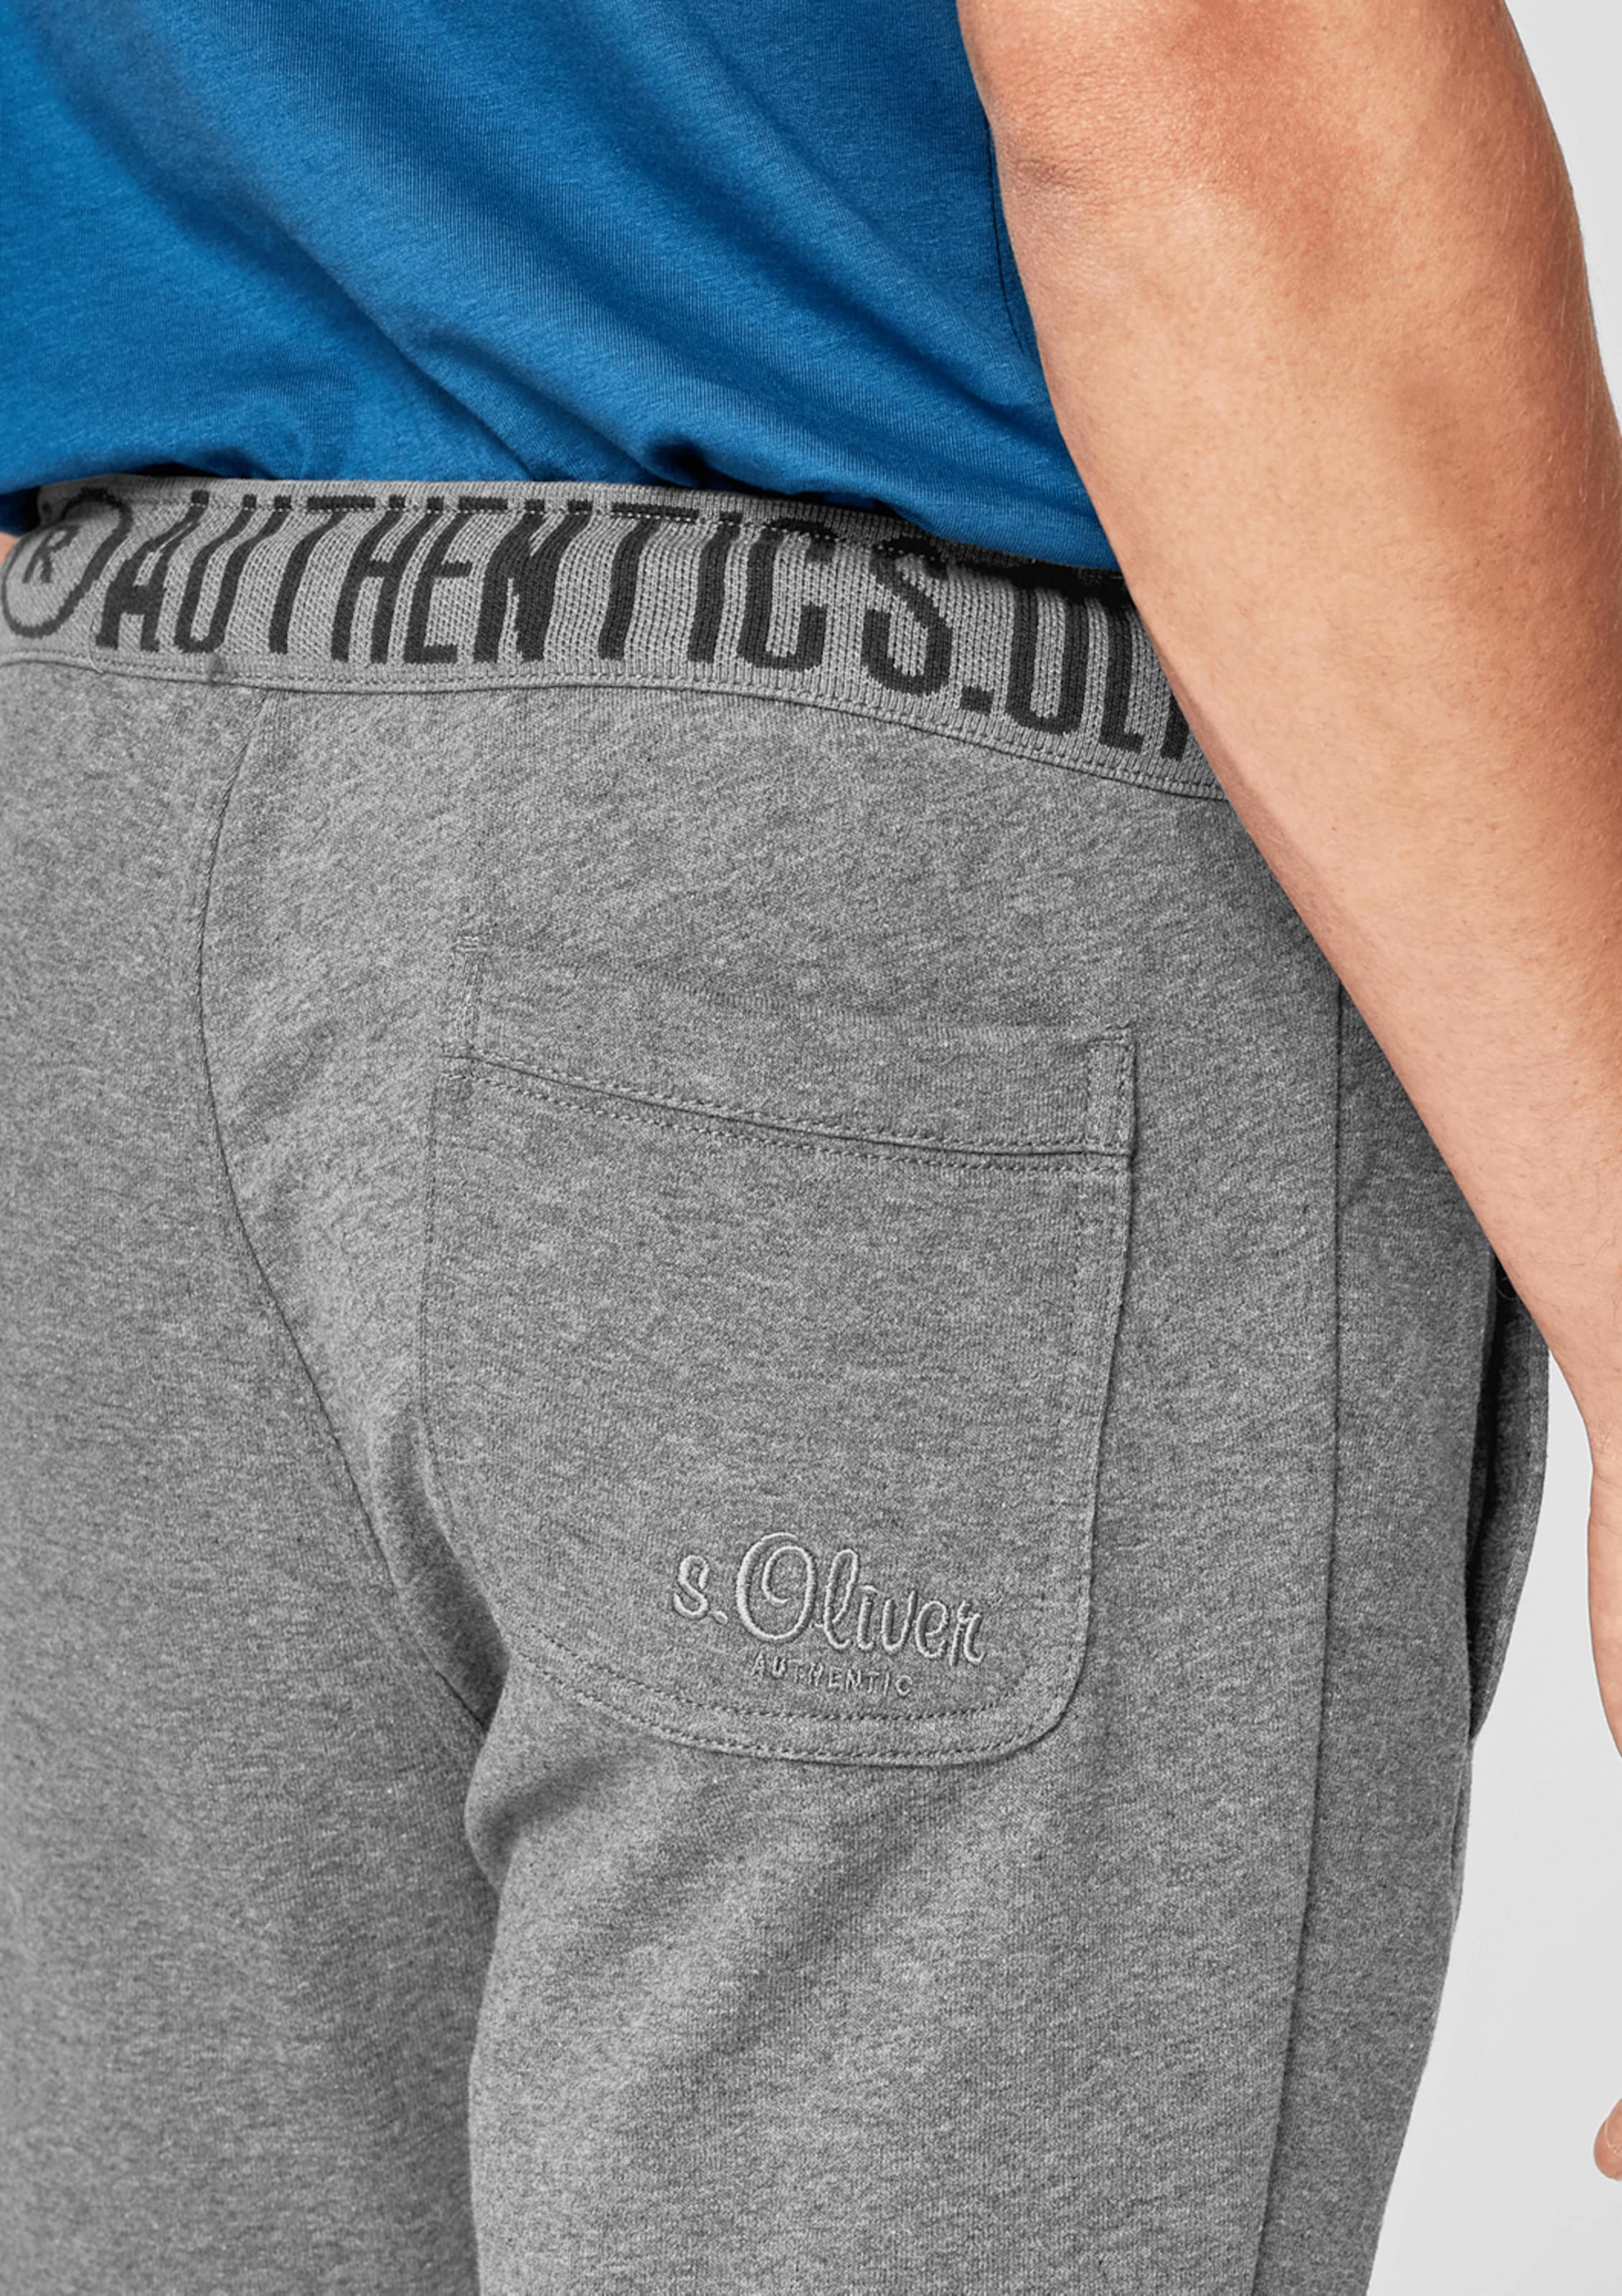 Red Sweatpants In S Label oliver GraumeliertSchwarz b7g6fy